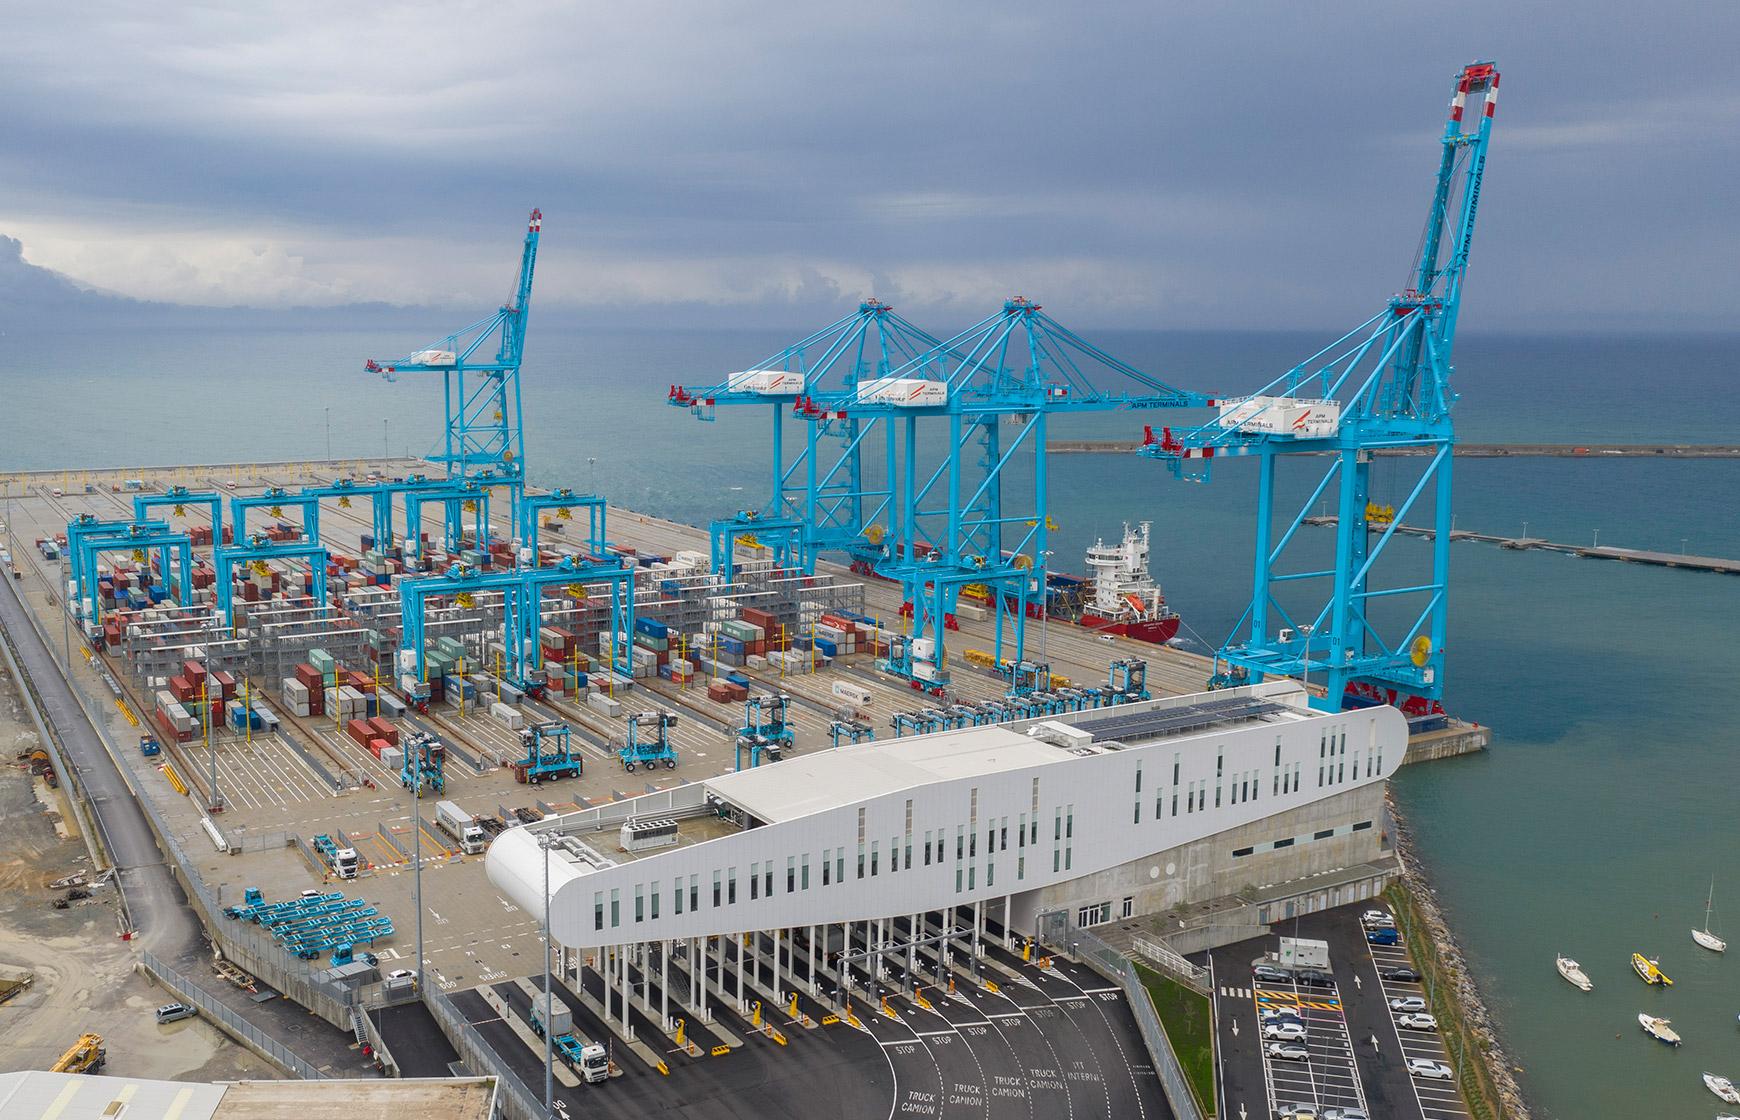 Vado Ligure welcomes COSCO vessels